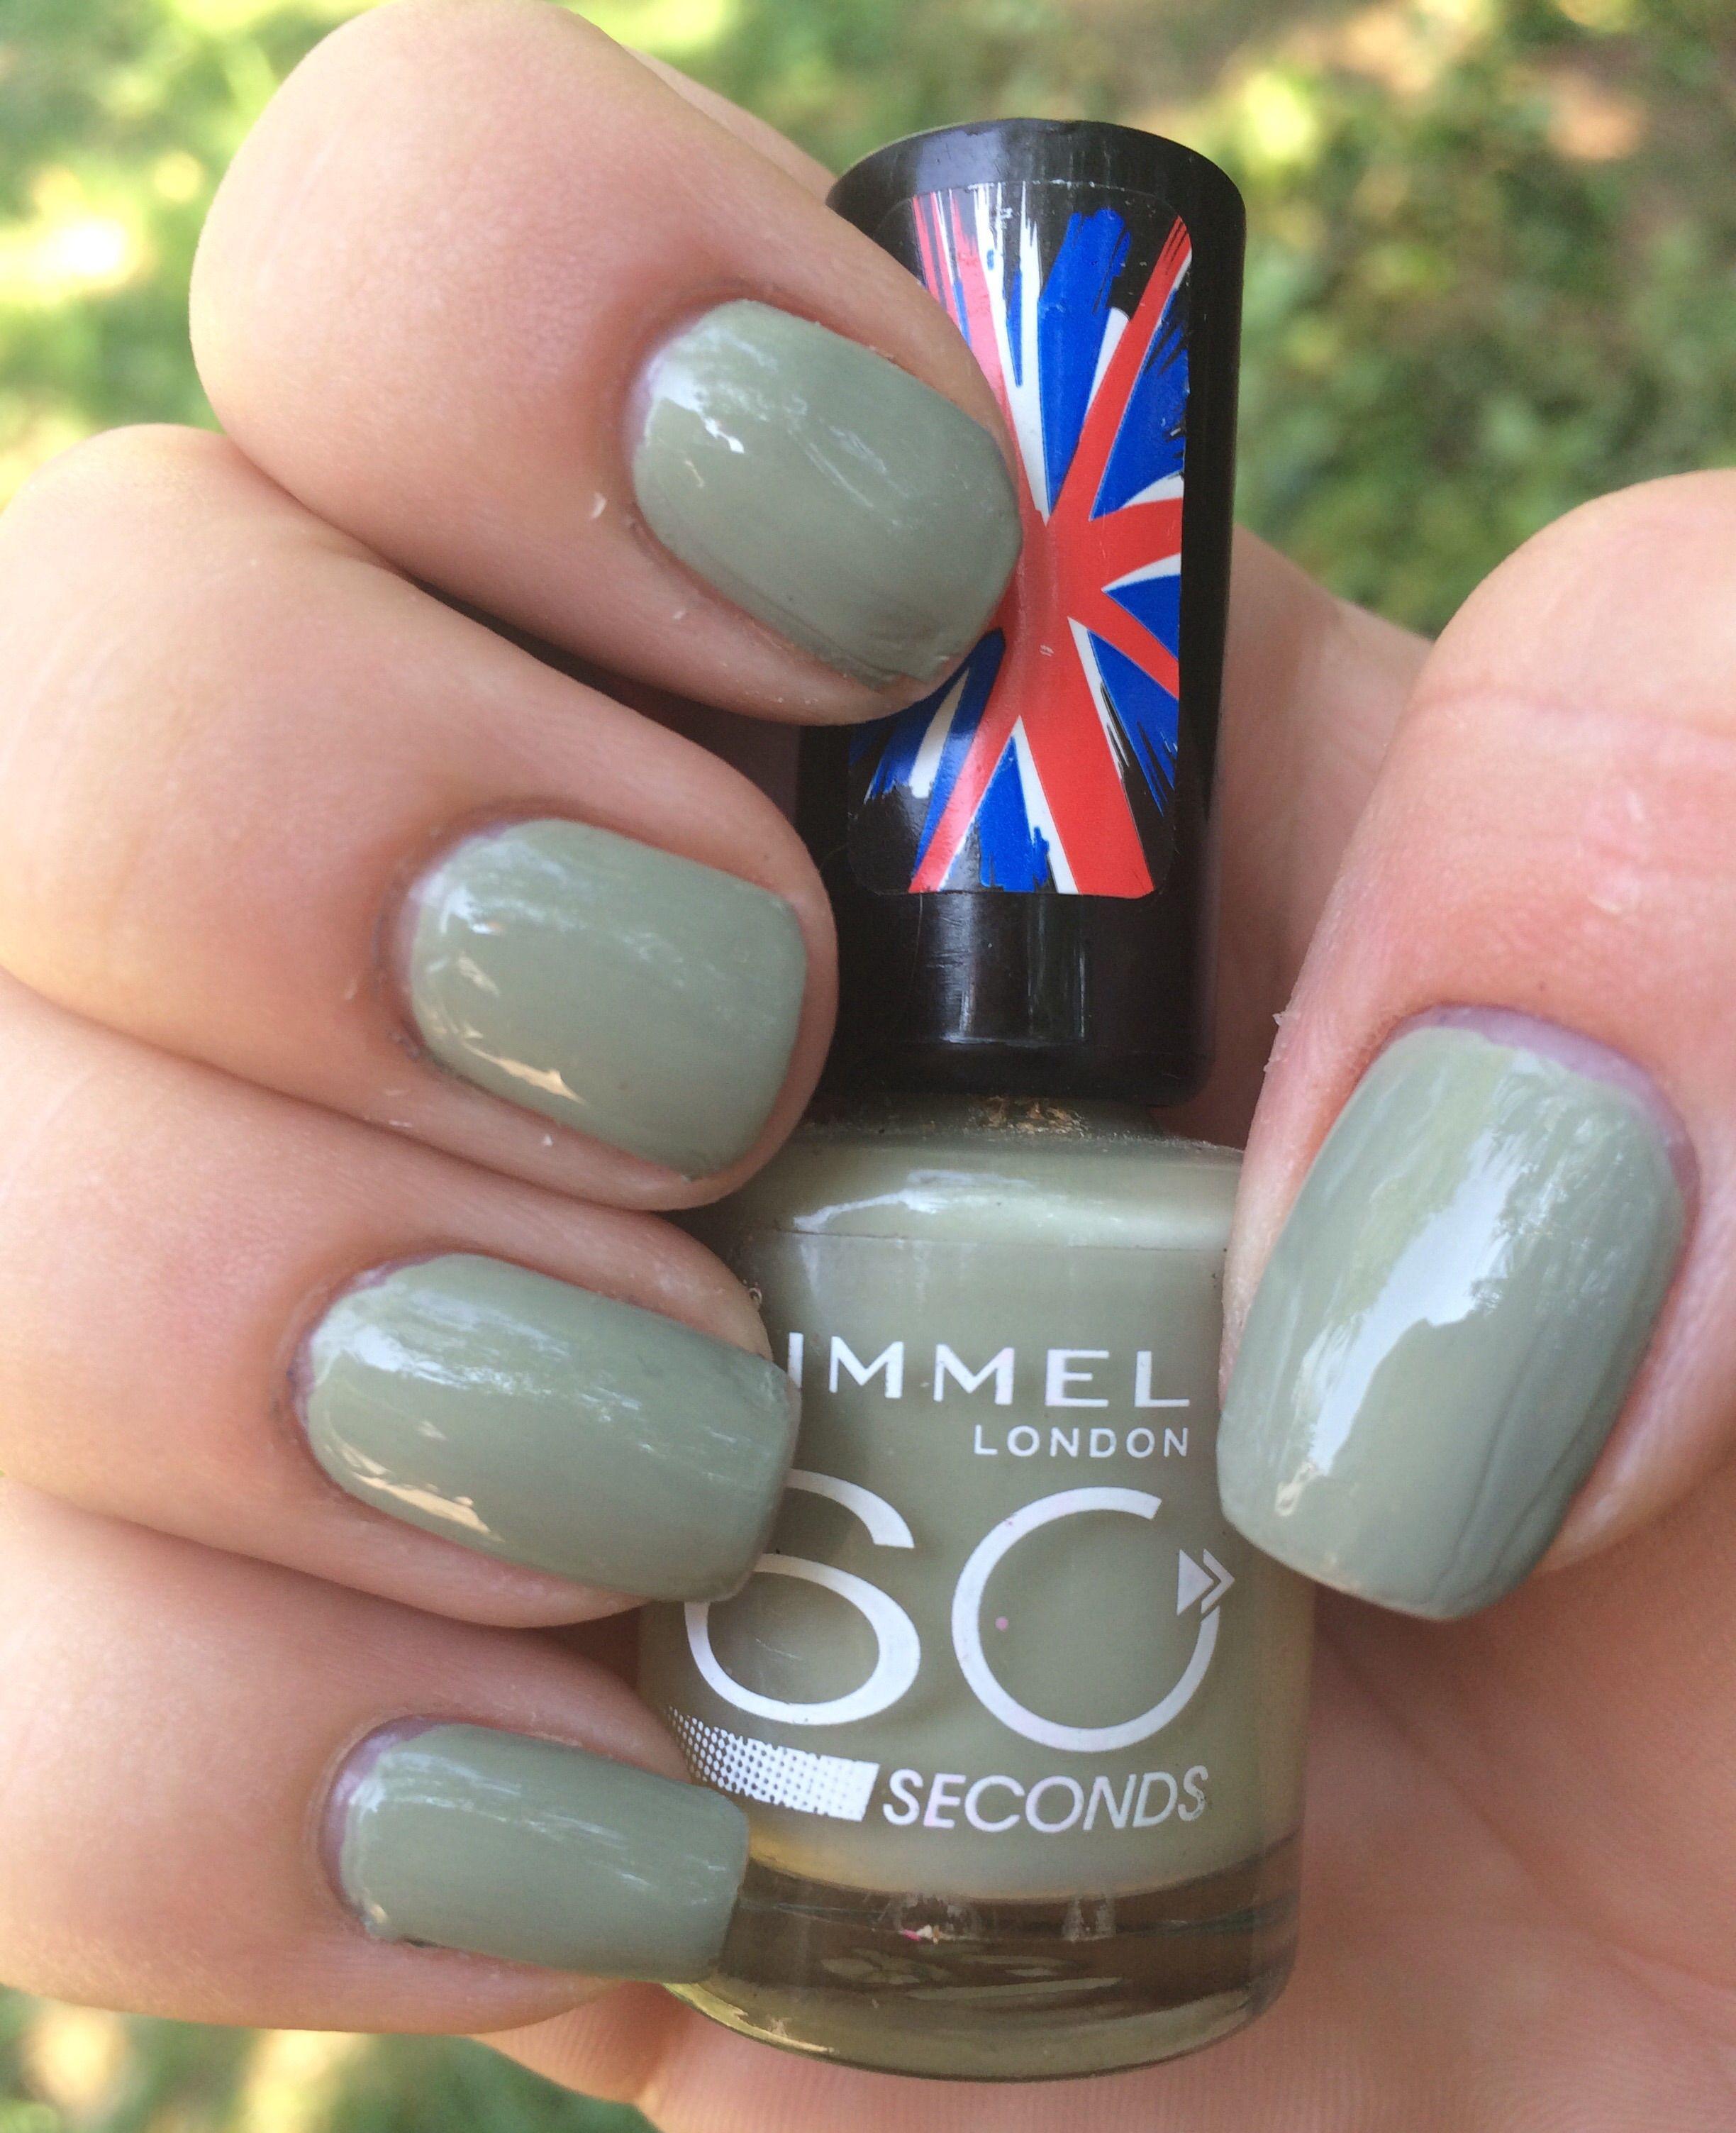 44. Rimmel London 60 Seconds: Sage All The Rage #Nails #NailPorn ...